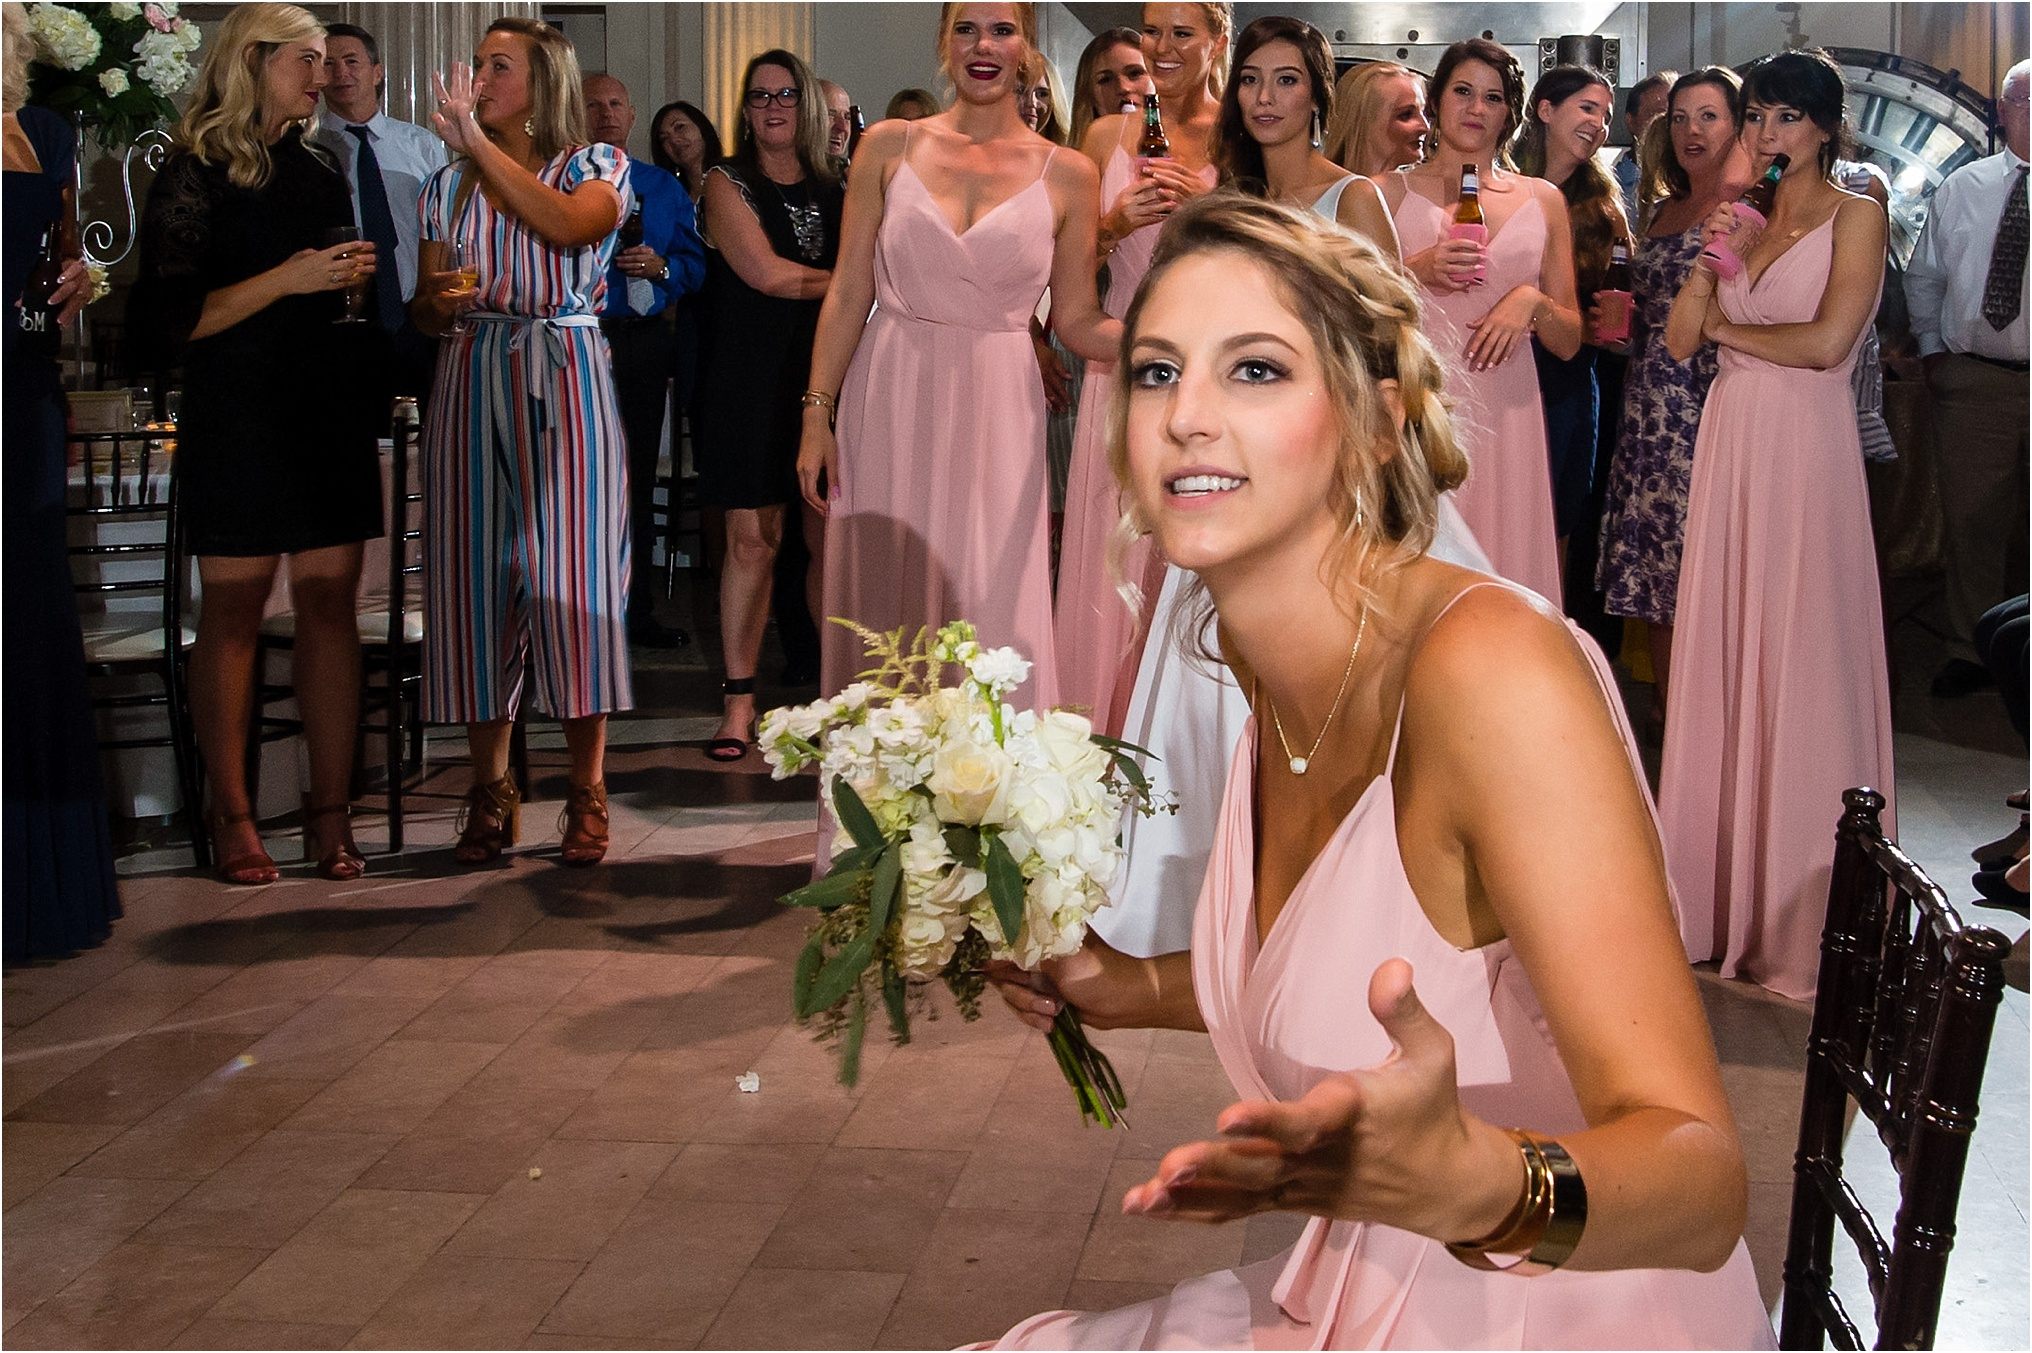 st-augustine-wedding-photographer-143.jpg